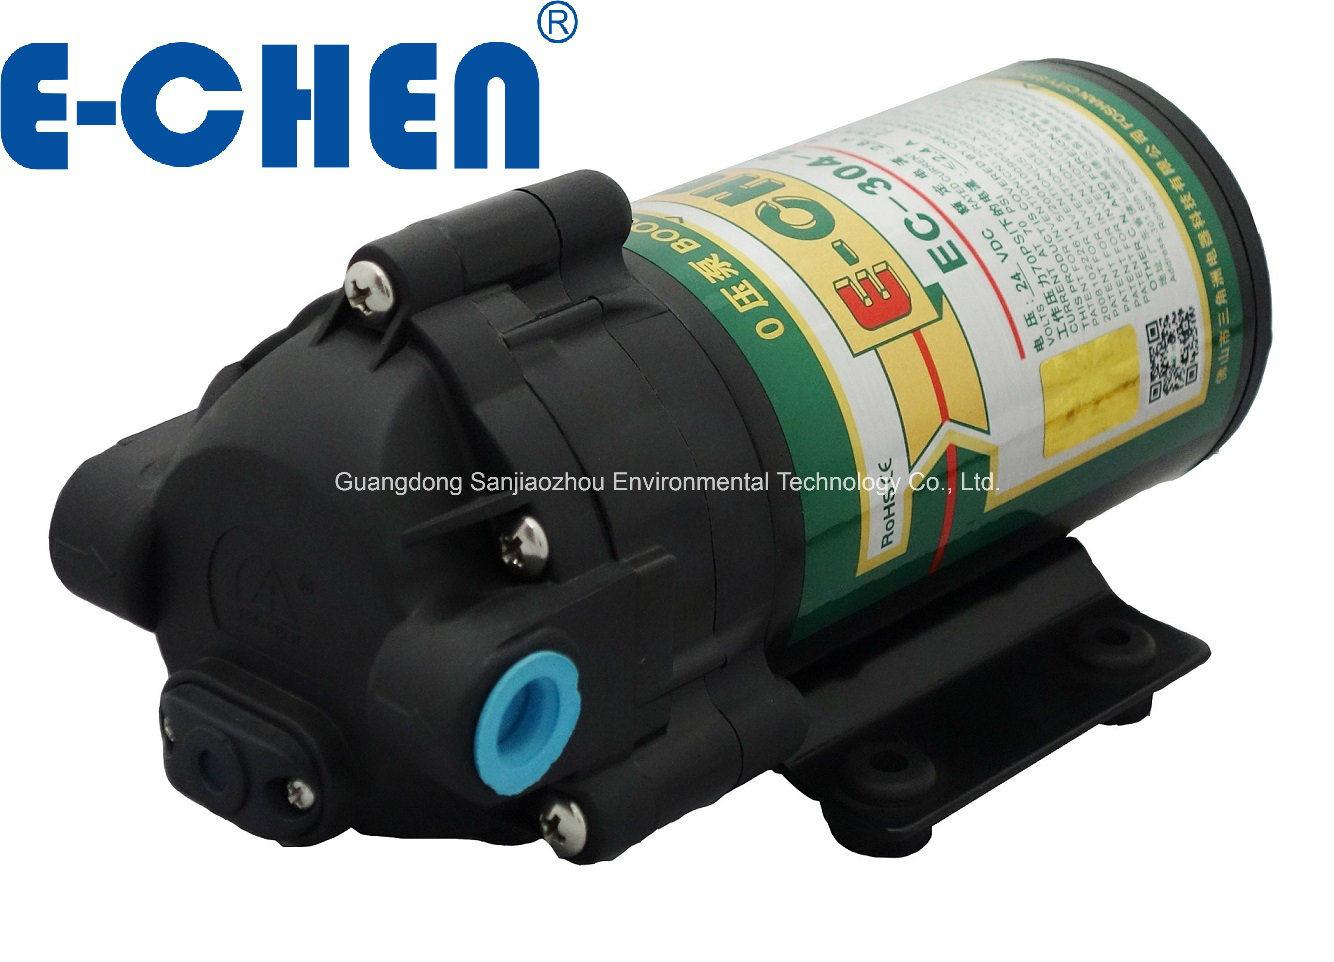 E-Chen 304 Series 75gpd Diaphragm RO Booster Pump - Designed for 0 Inlet Pressure Water Pump